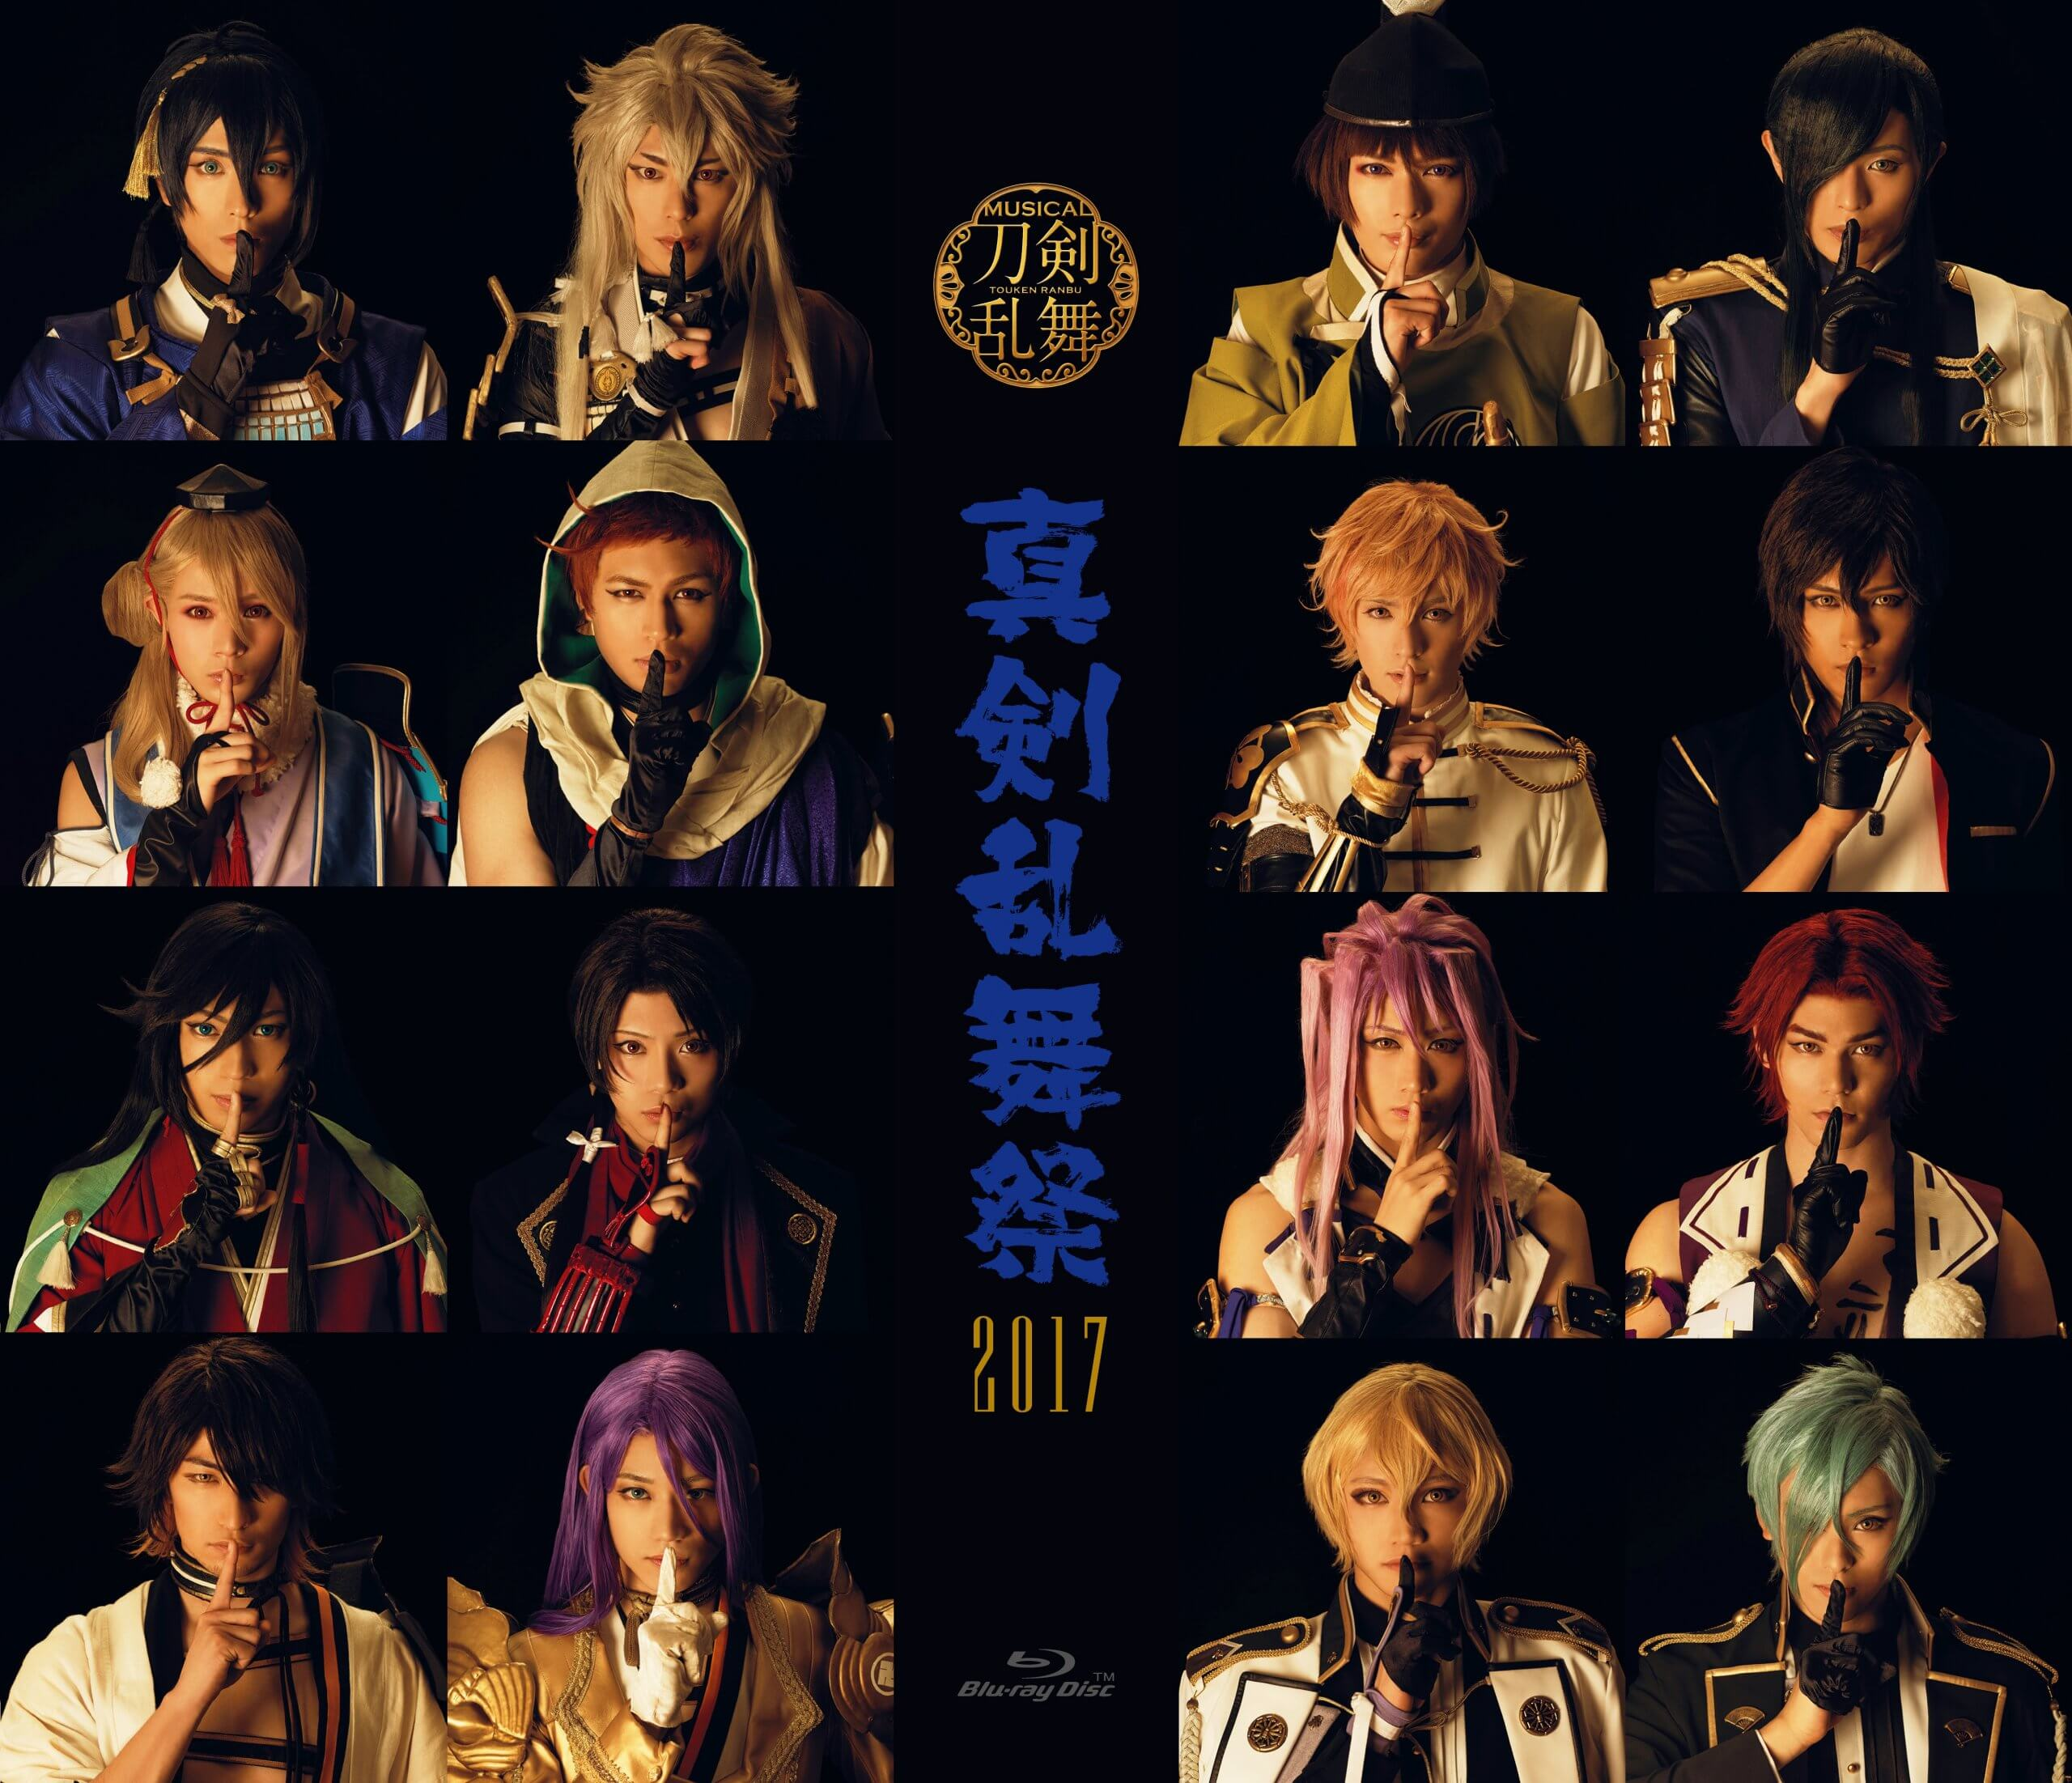 EMPB-9 / ミュージカル『刀剣乱舞』 〜真剣乱舞祭2017〜 / ミュージカル『刀剣乱舞』 / Blu-ray